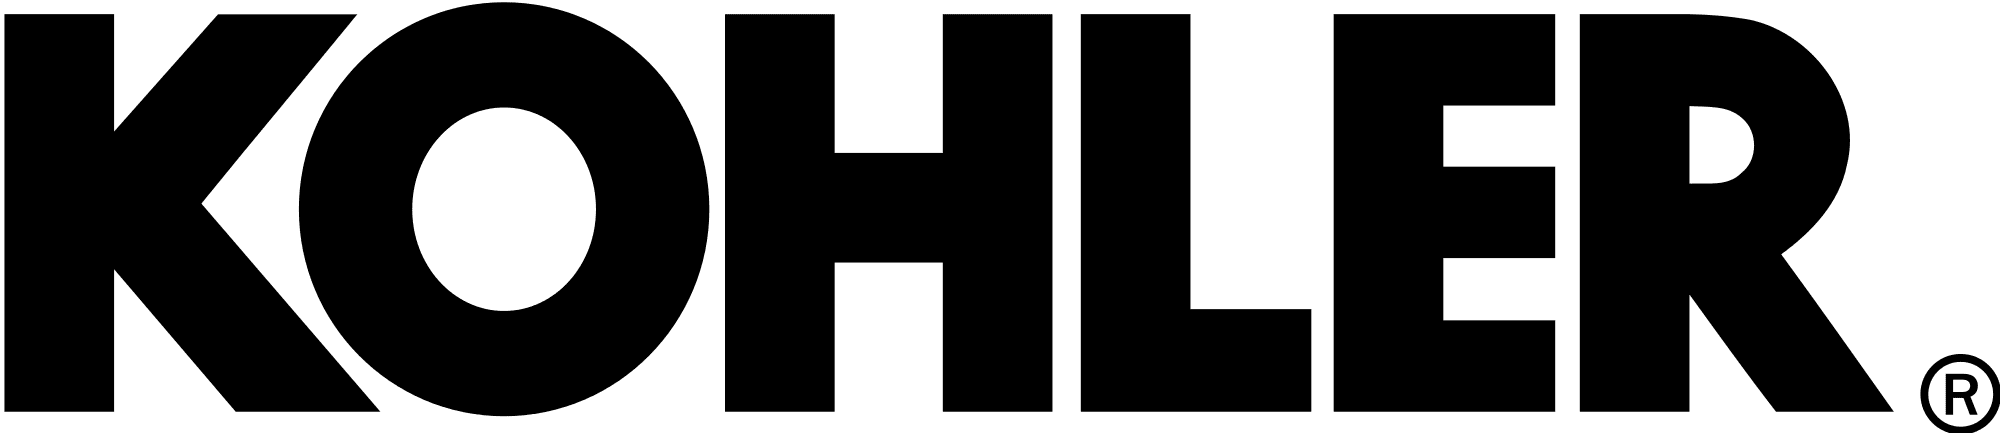 https://coorsexteriors.com/wp-content/uploads/2018/11/Kohler-Logo.png